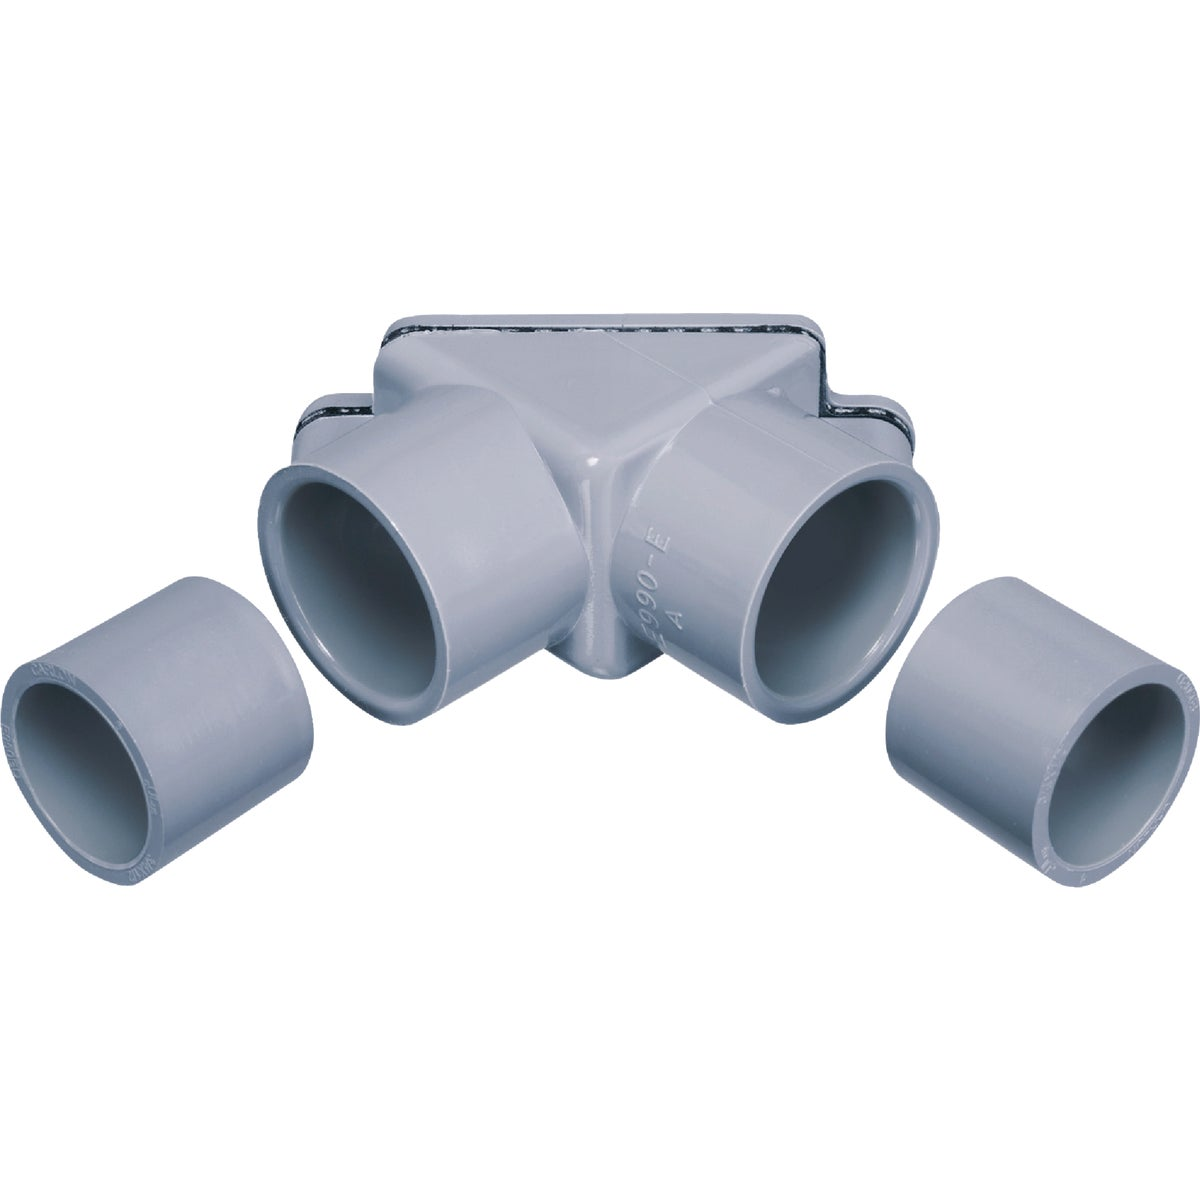 "1/2-3/4"" PVC PULL ELBOW"